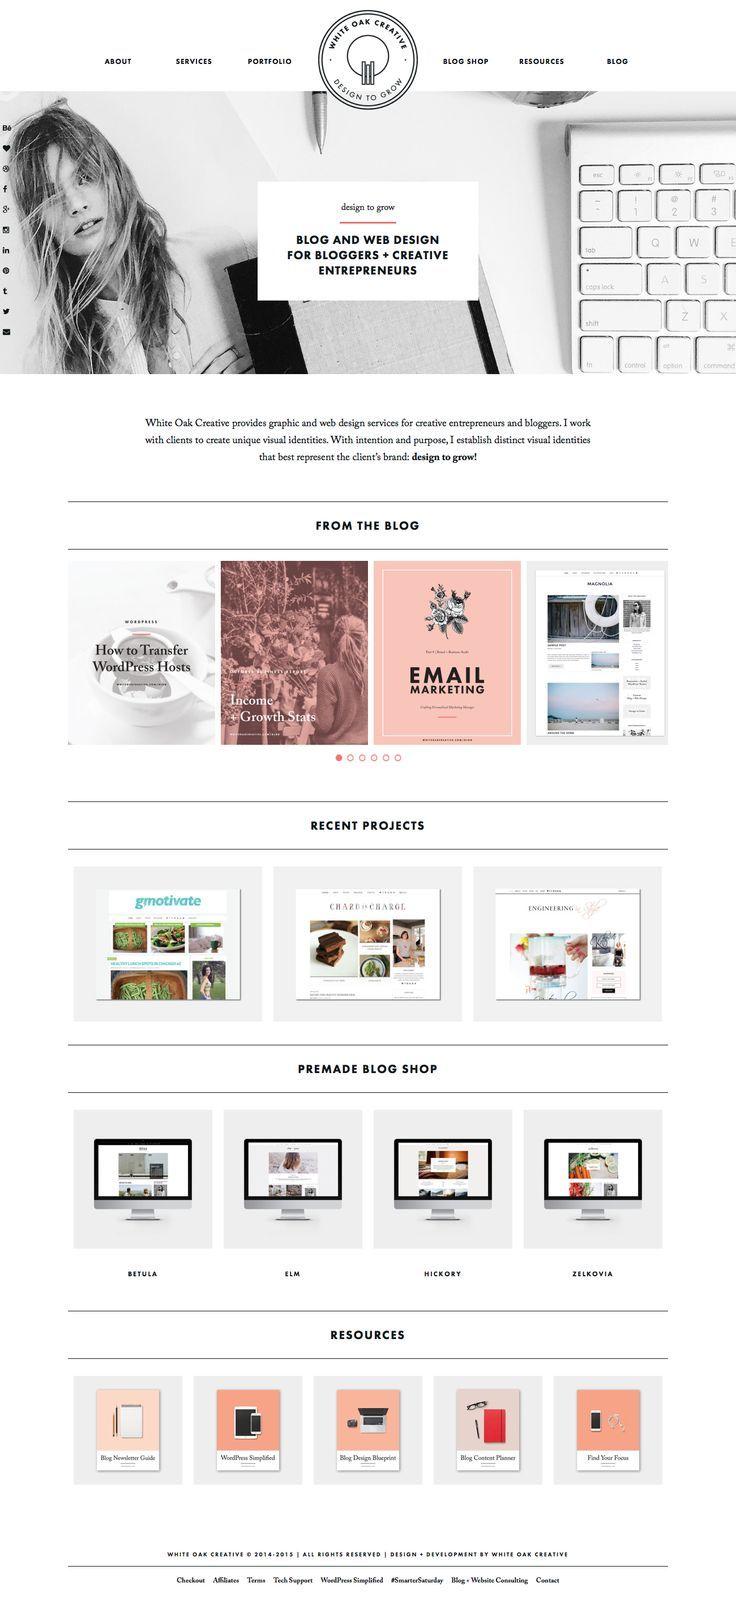 White Oak Creative Blog and Web Design for Creative Entrepreneurs and Bloggers, logo design, blog design, branding, wordpress blog design